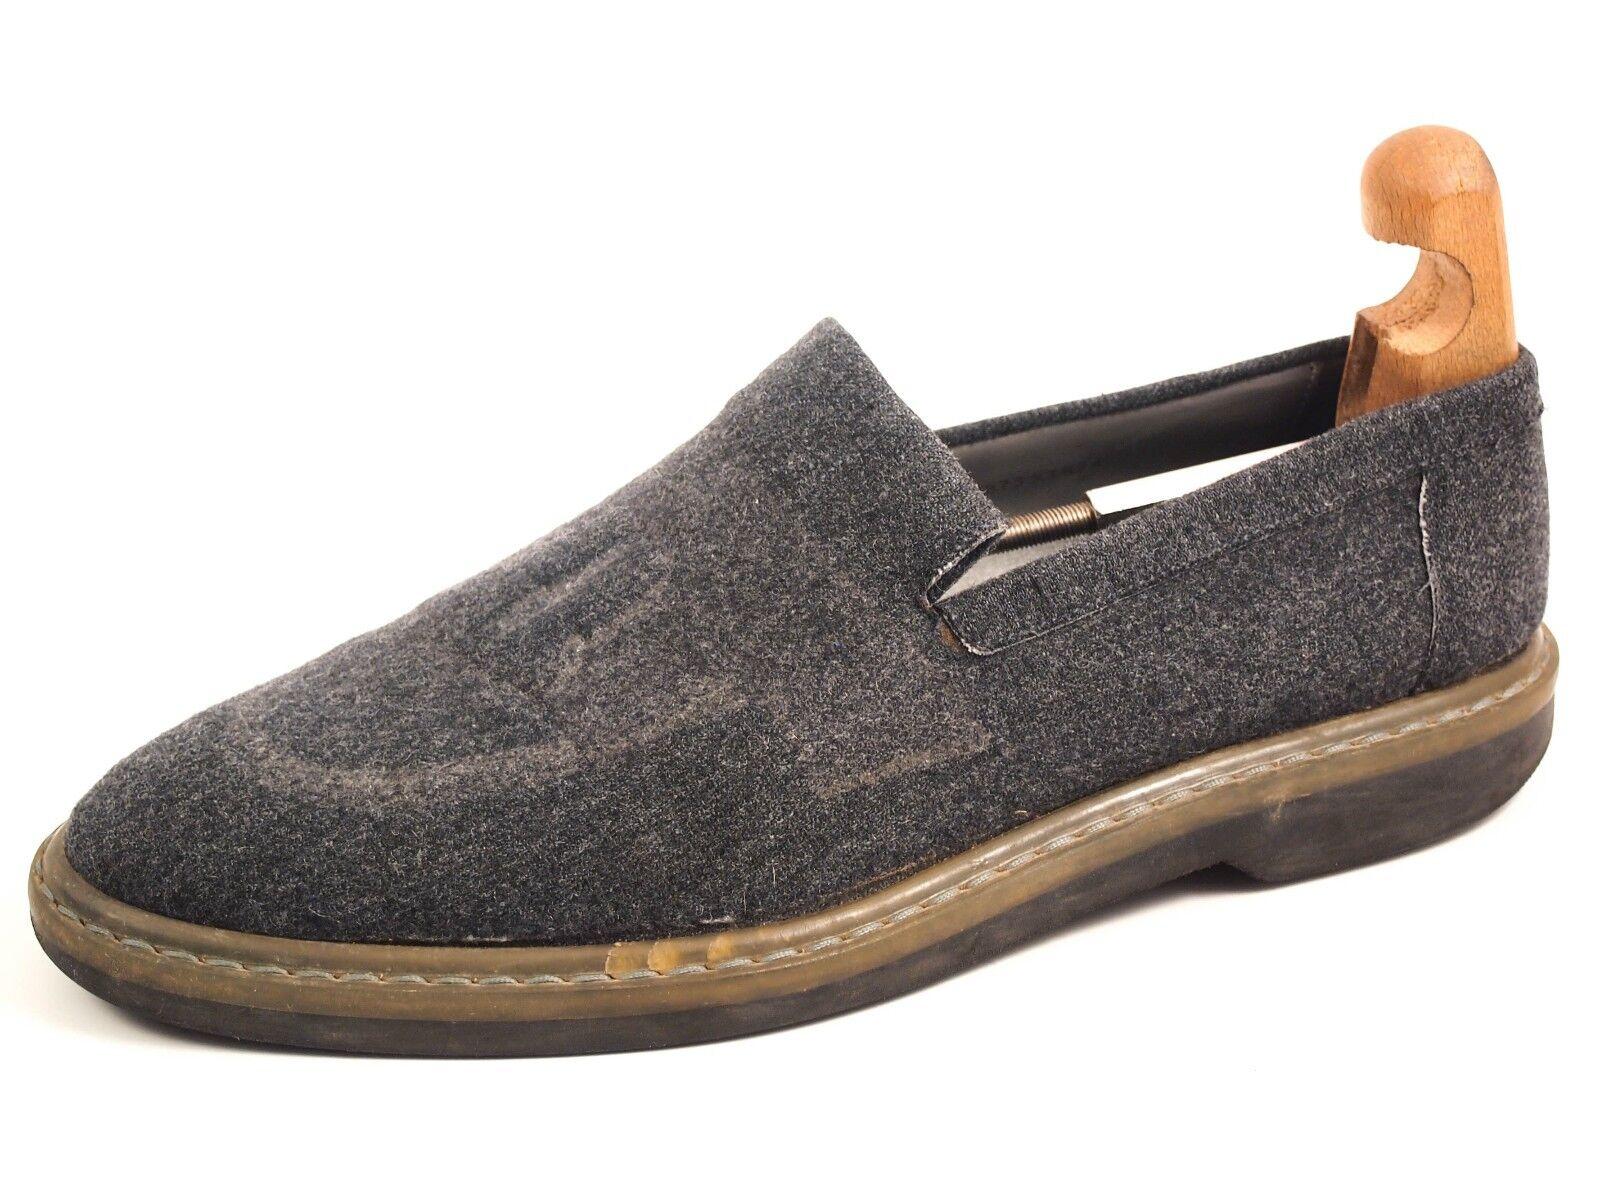 Emporio Armani moccasins, grey wool, men's shoe size US 10 EU 43